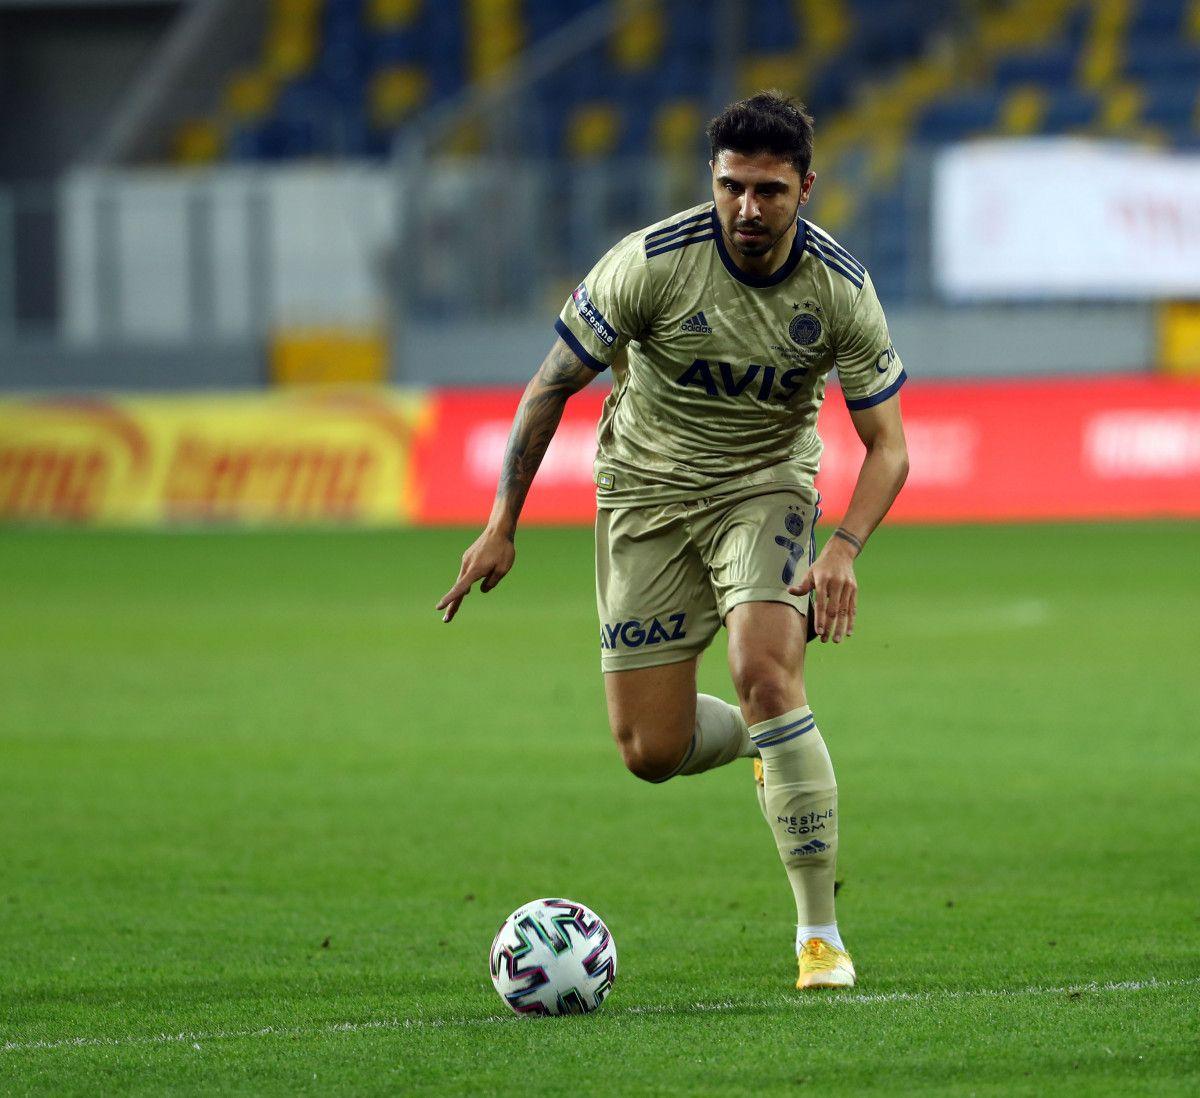 Fenerbahçe, Ozan Tufan ı Watford a kiraladı #1